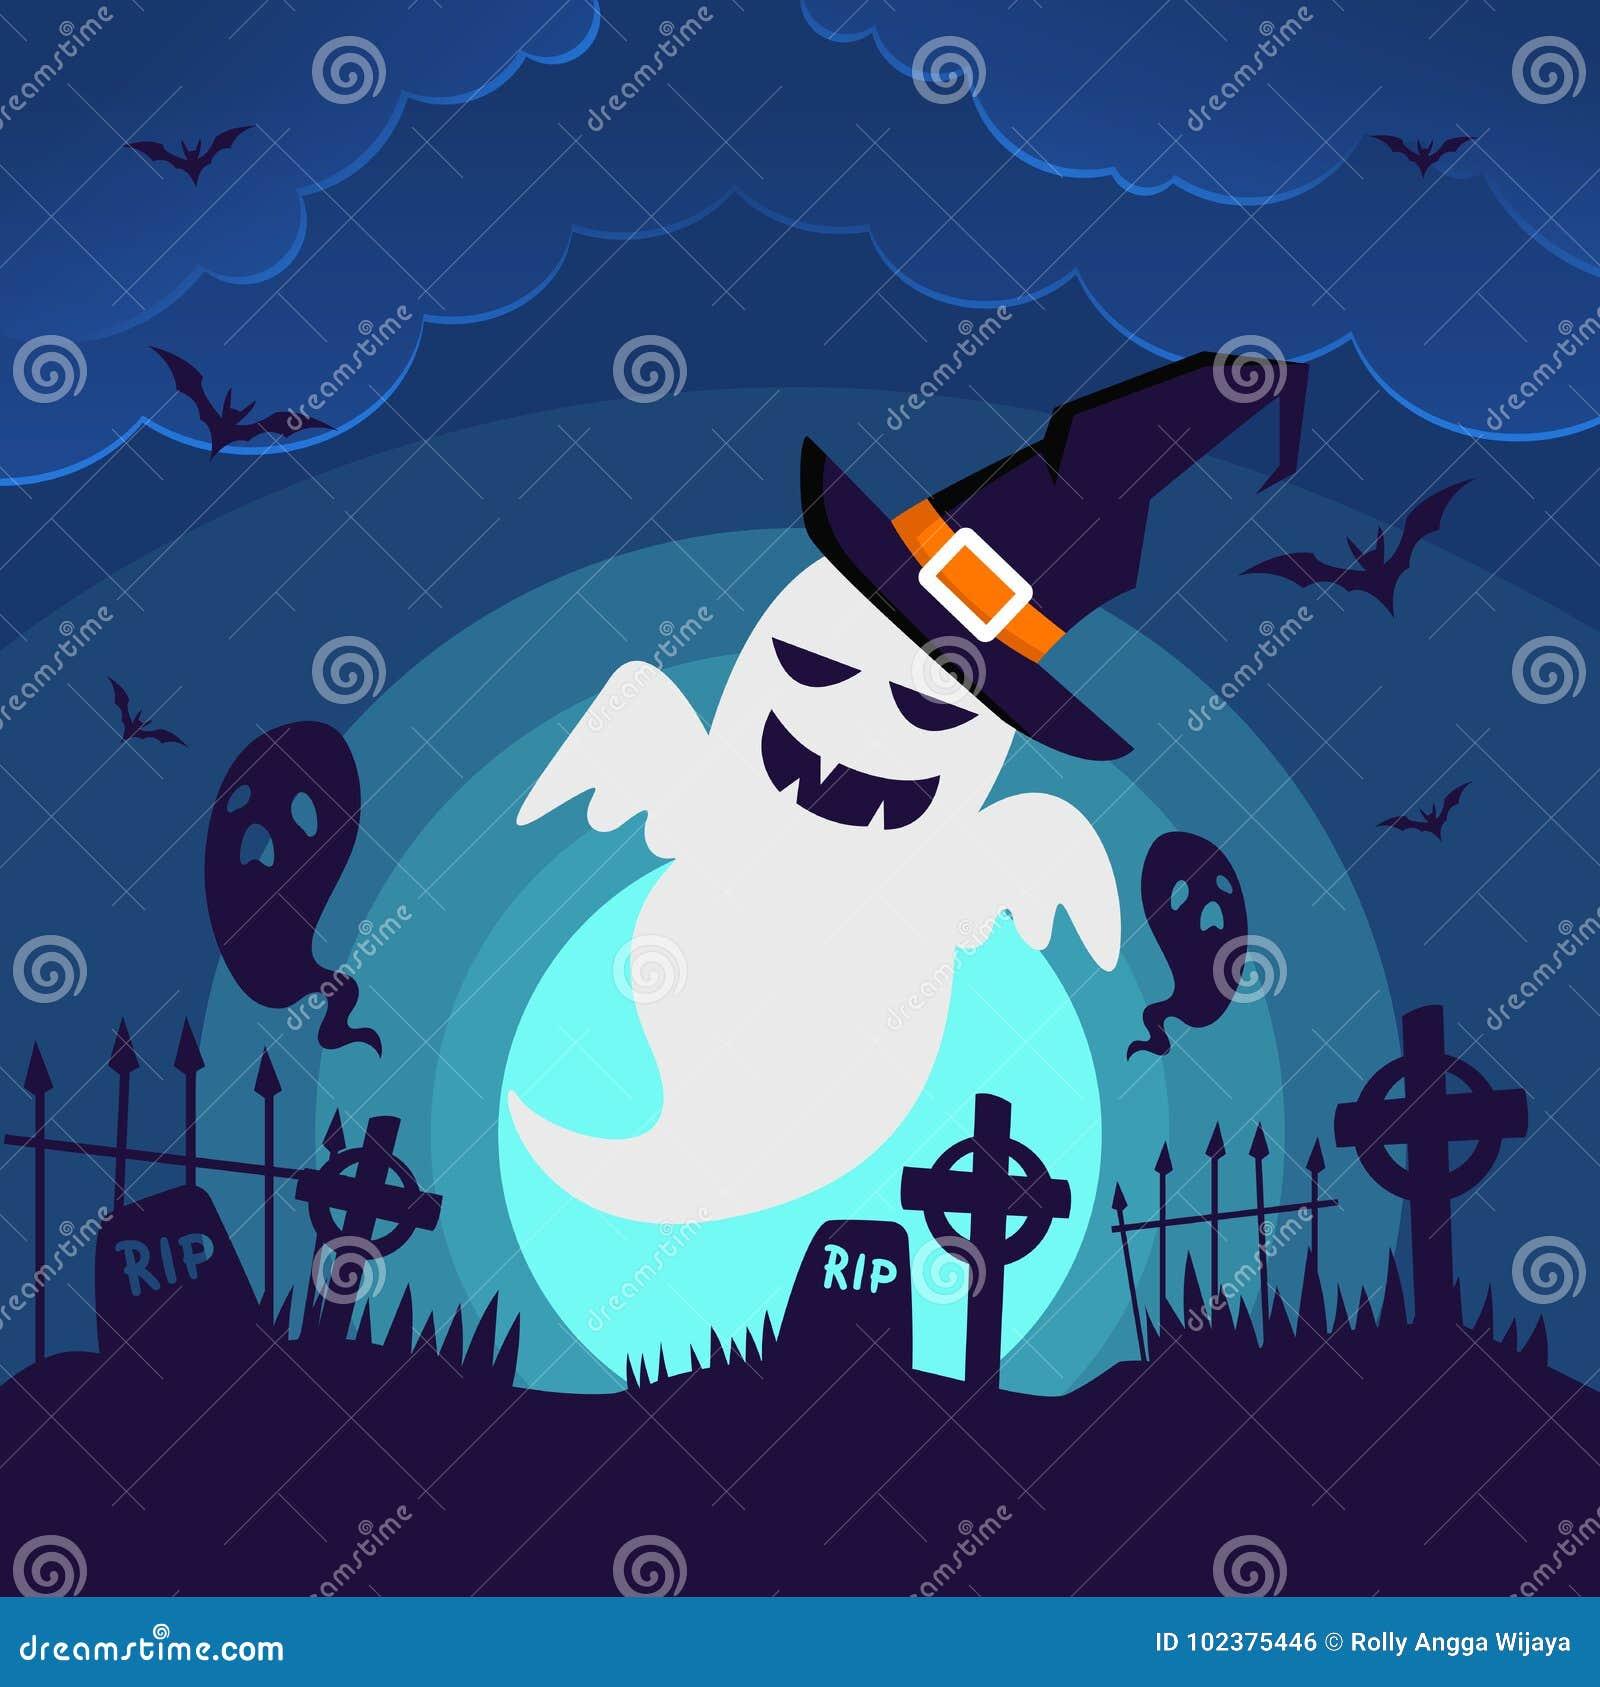 Amazing Wallpaper Halloween Ghost - halloween-ghost-wallpaper-background-halloween-ghost-wallpaper-background-eps-102375446  Photograph_355594.jpg